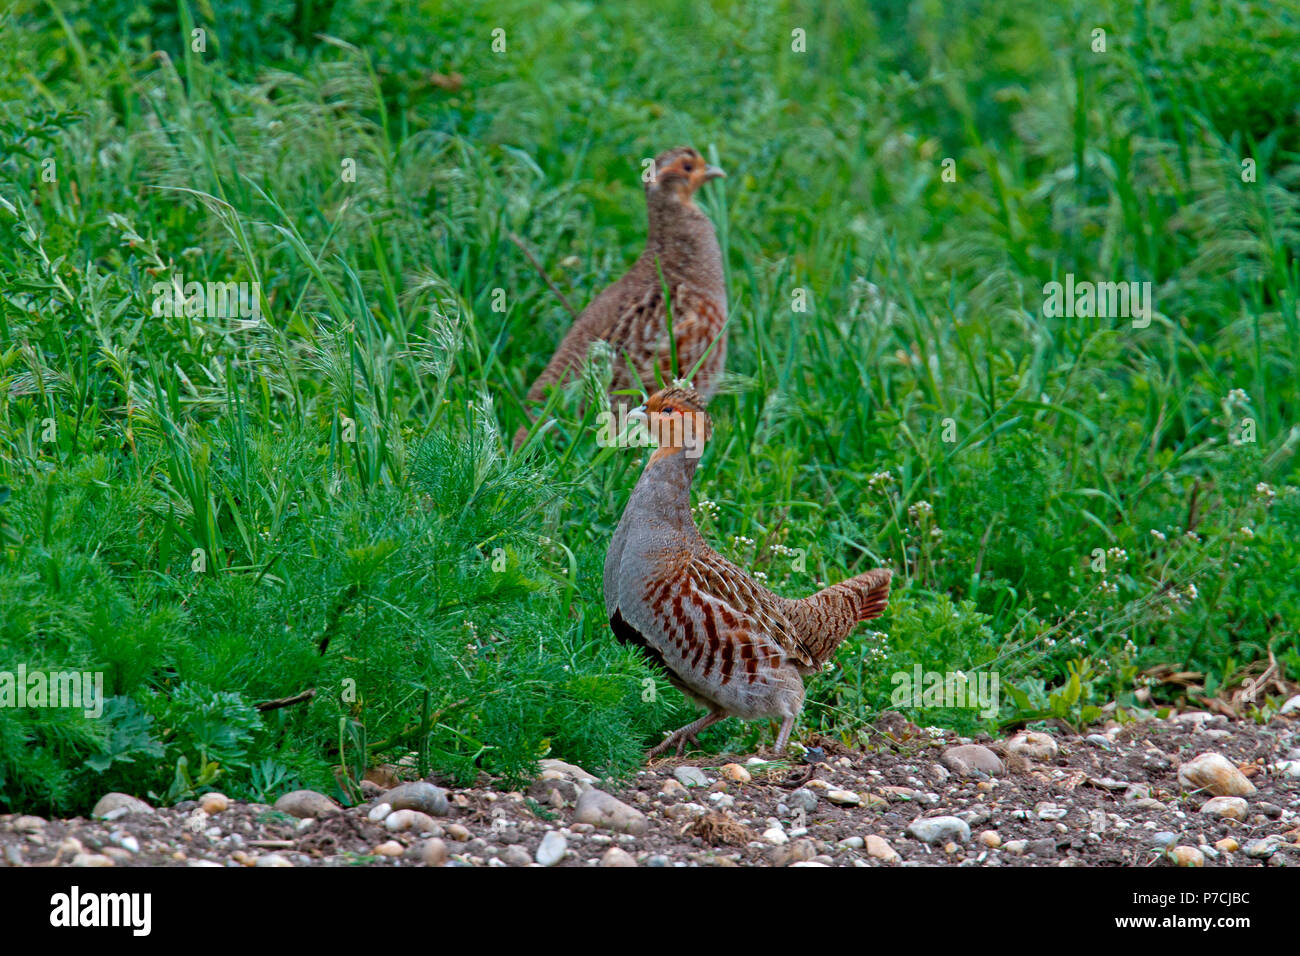 grey partridges, (Perdix perdix) - Stock Image